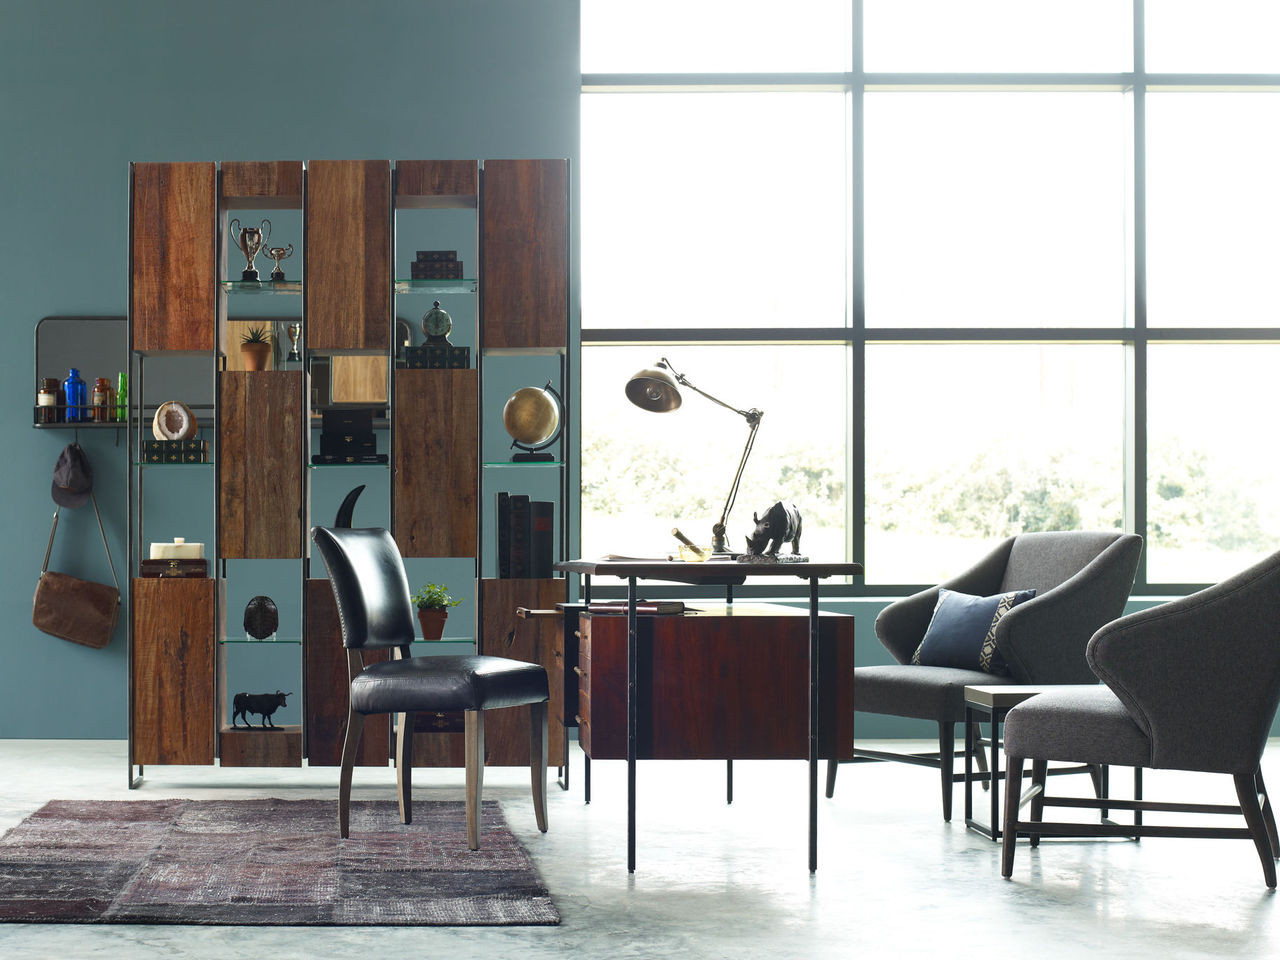 Industrial Wall Mirror catlin industrial entryway wall mirror with reclaimed wood shelf